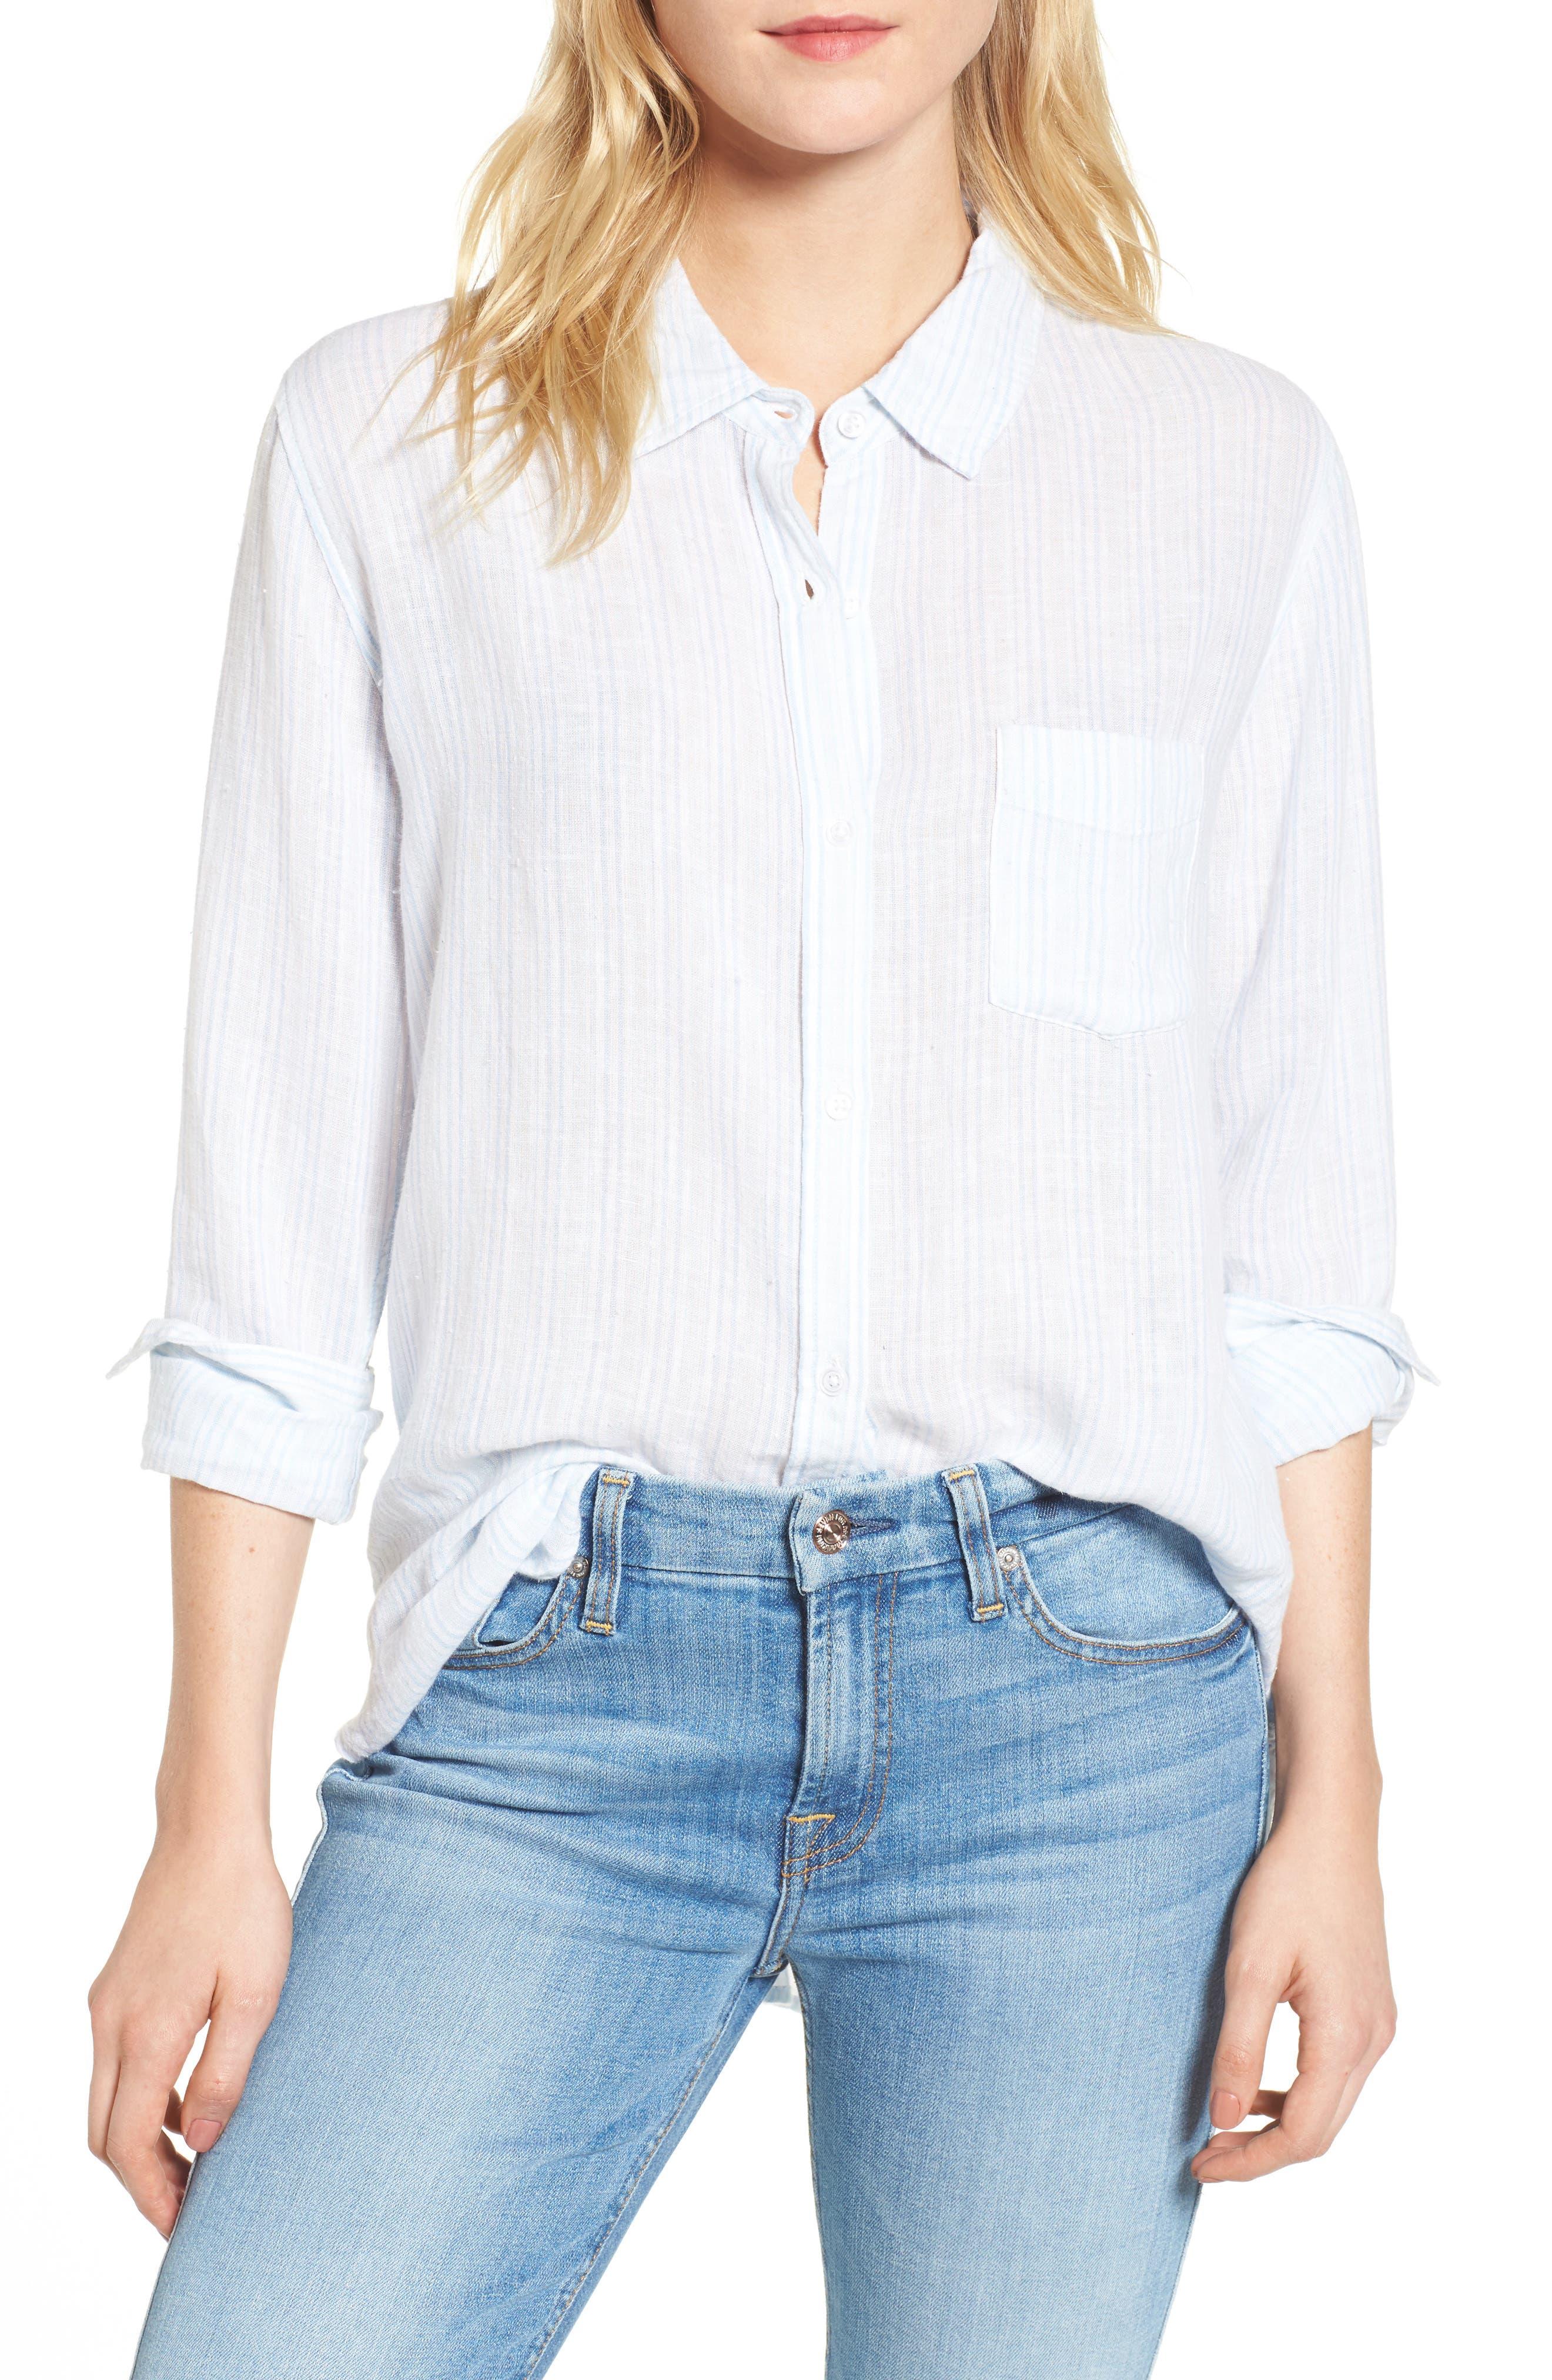 Alternate Image 1 Selected - Rails Charli Stripe Shirt